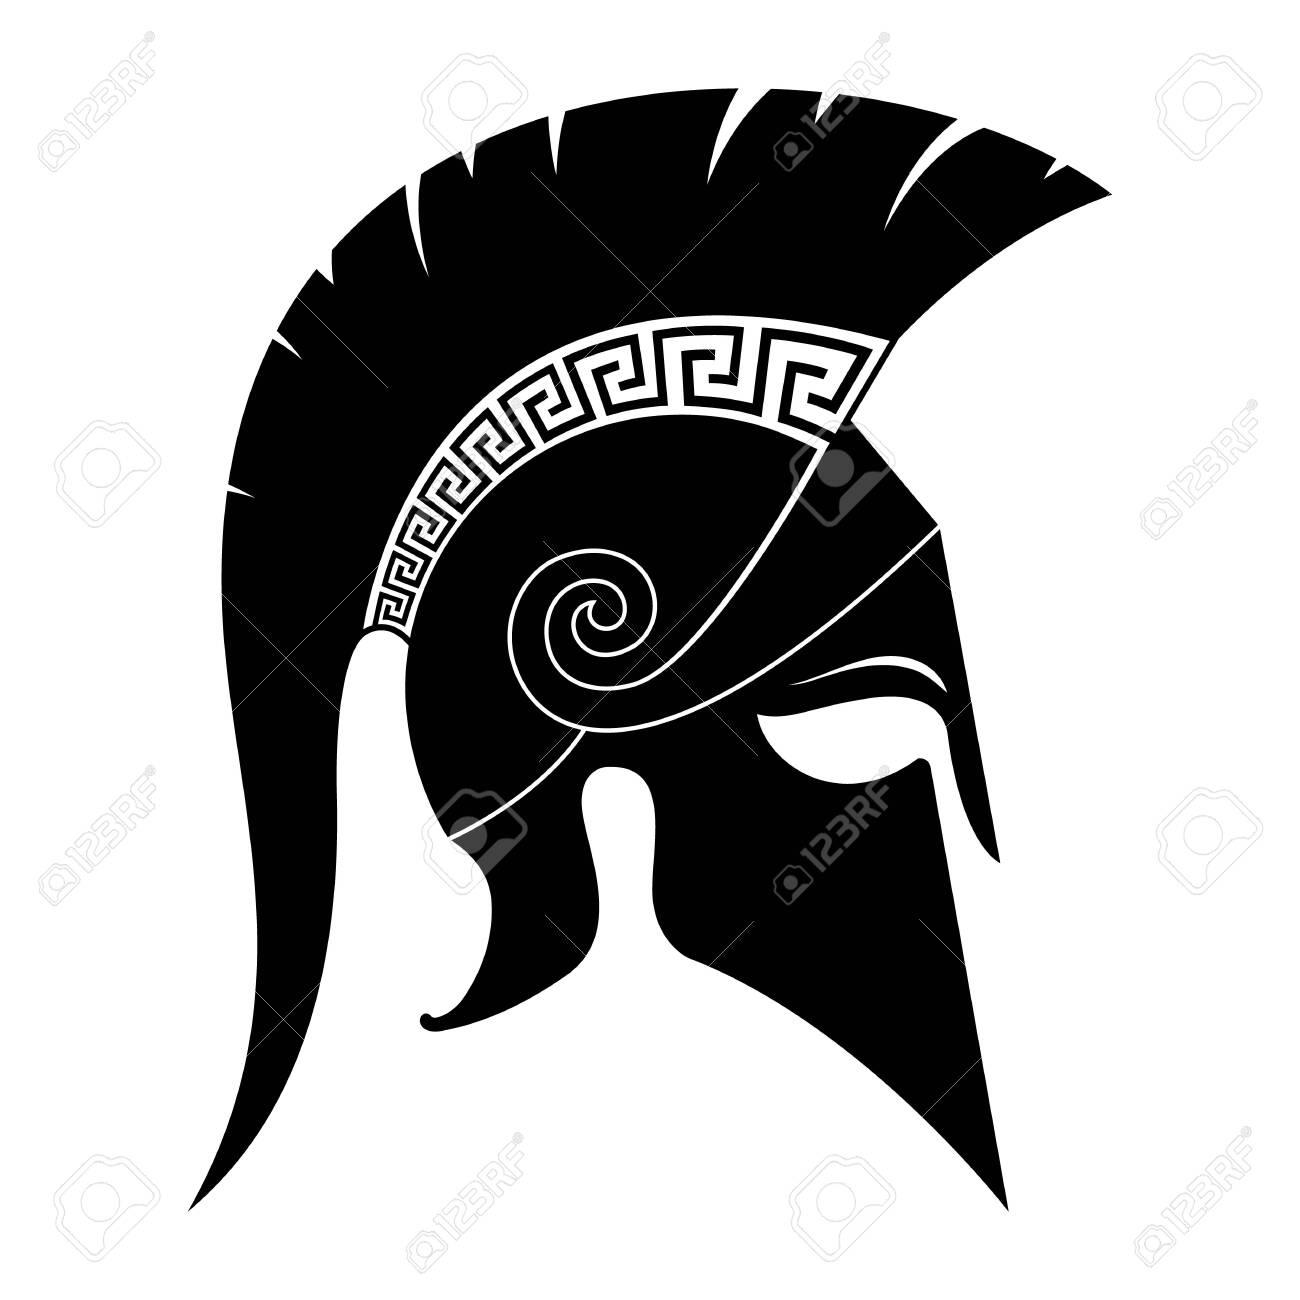 Black spartan helmet icon. Vector illustration. - 149379965